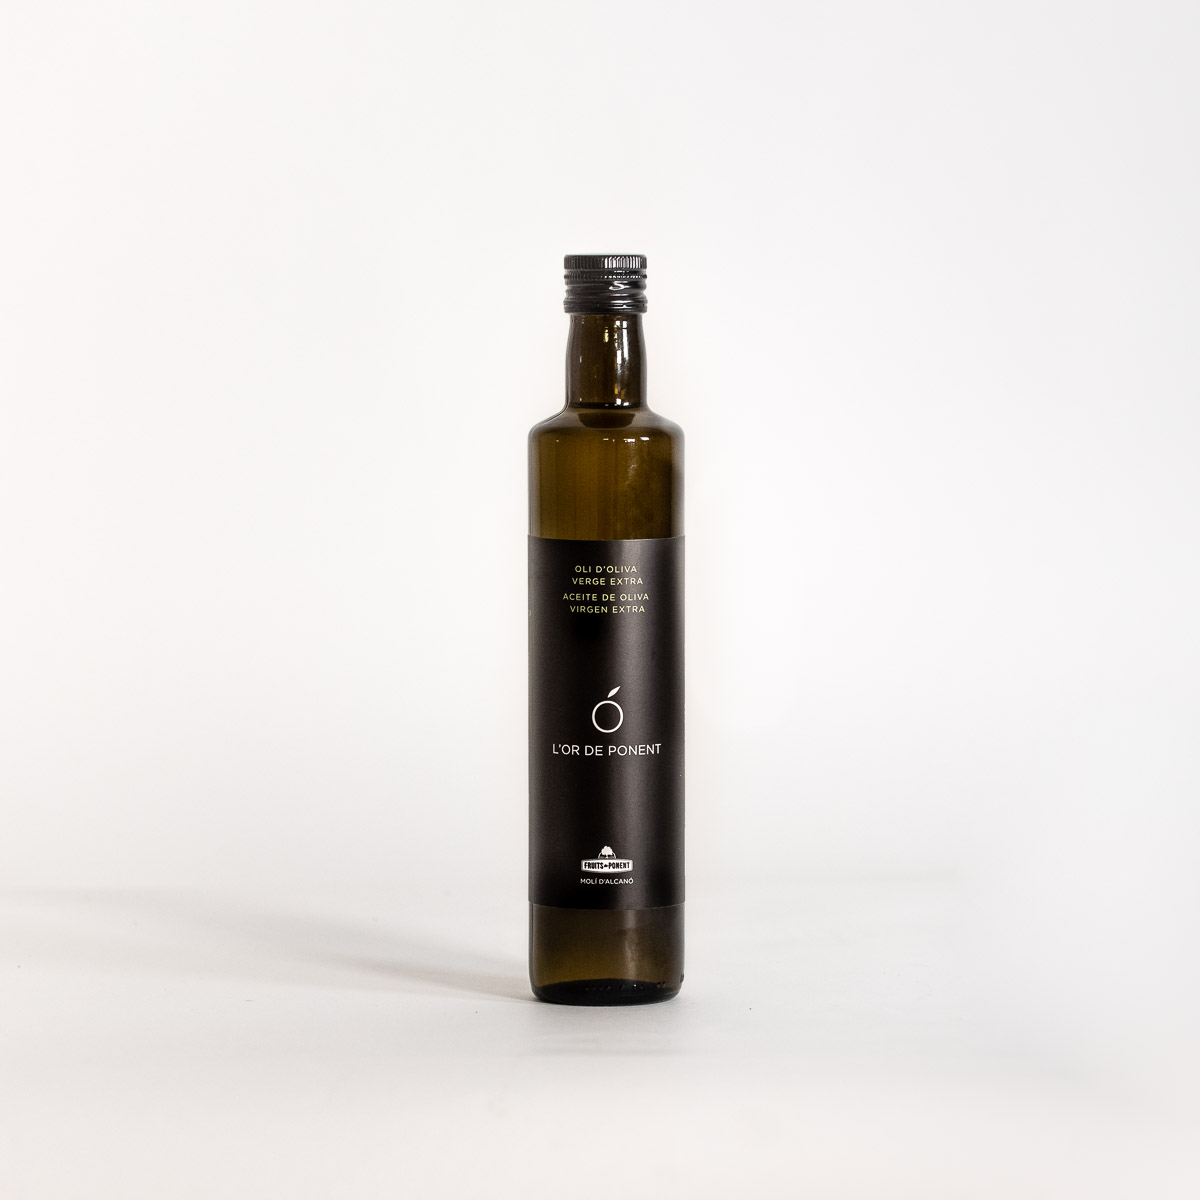 500 ml-Or-de-Ponent-aove-aceite-oliva-virgen-extra-garrigues-denominacion-origen-1